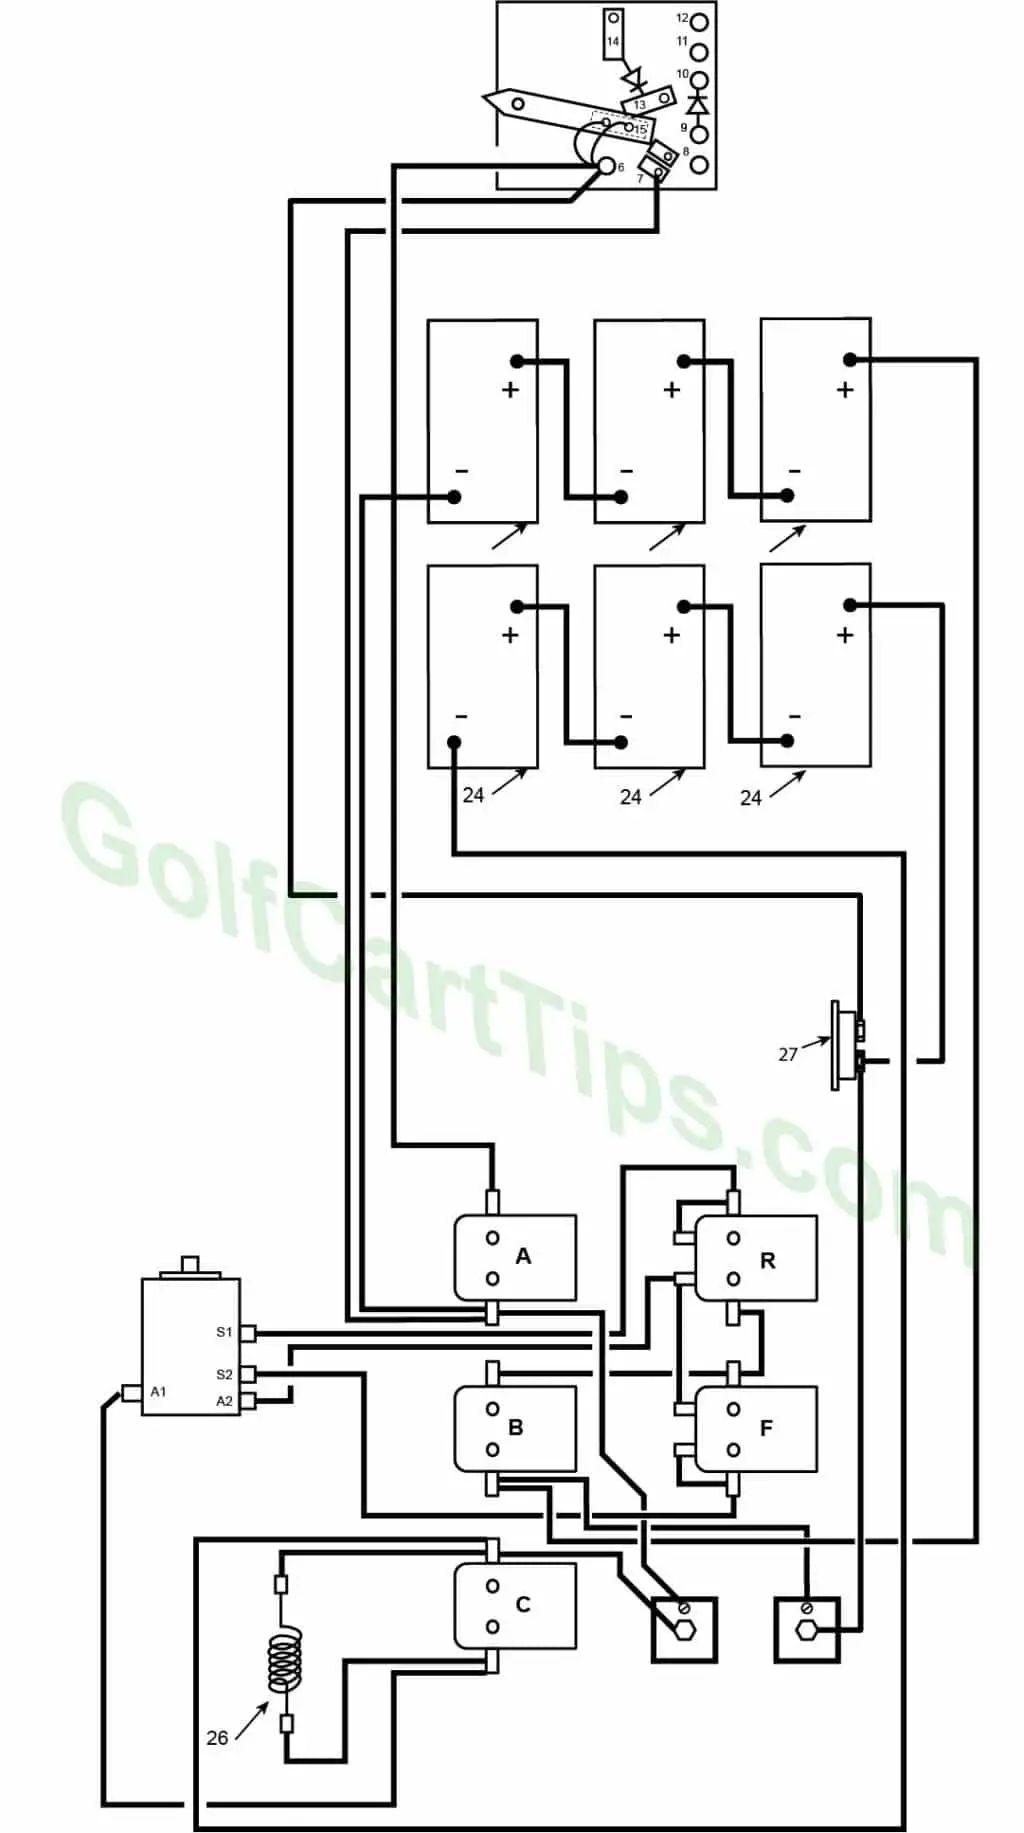 ford fuse box diagram fuse box ford 2003 harley davidson review